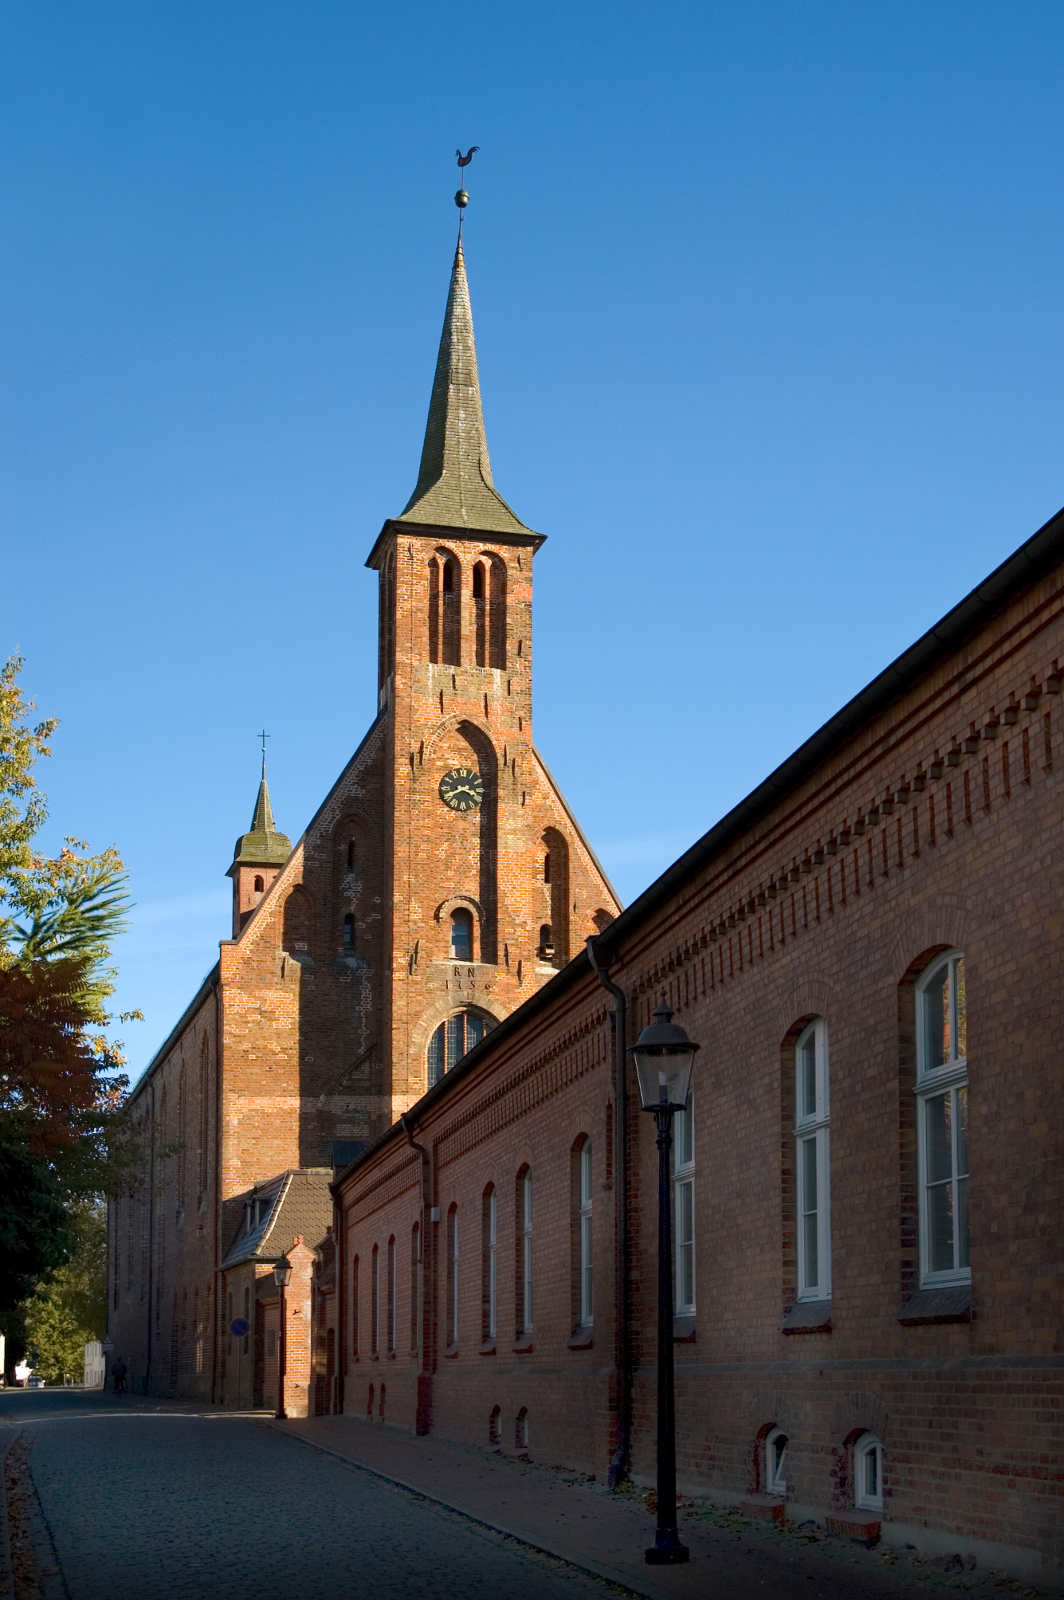 Klarissenkloster, Ribnitz